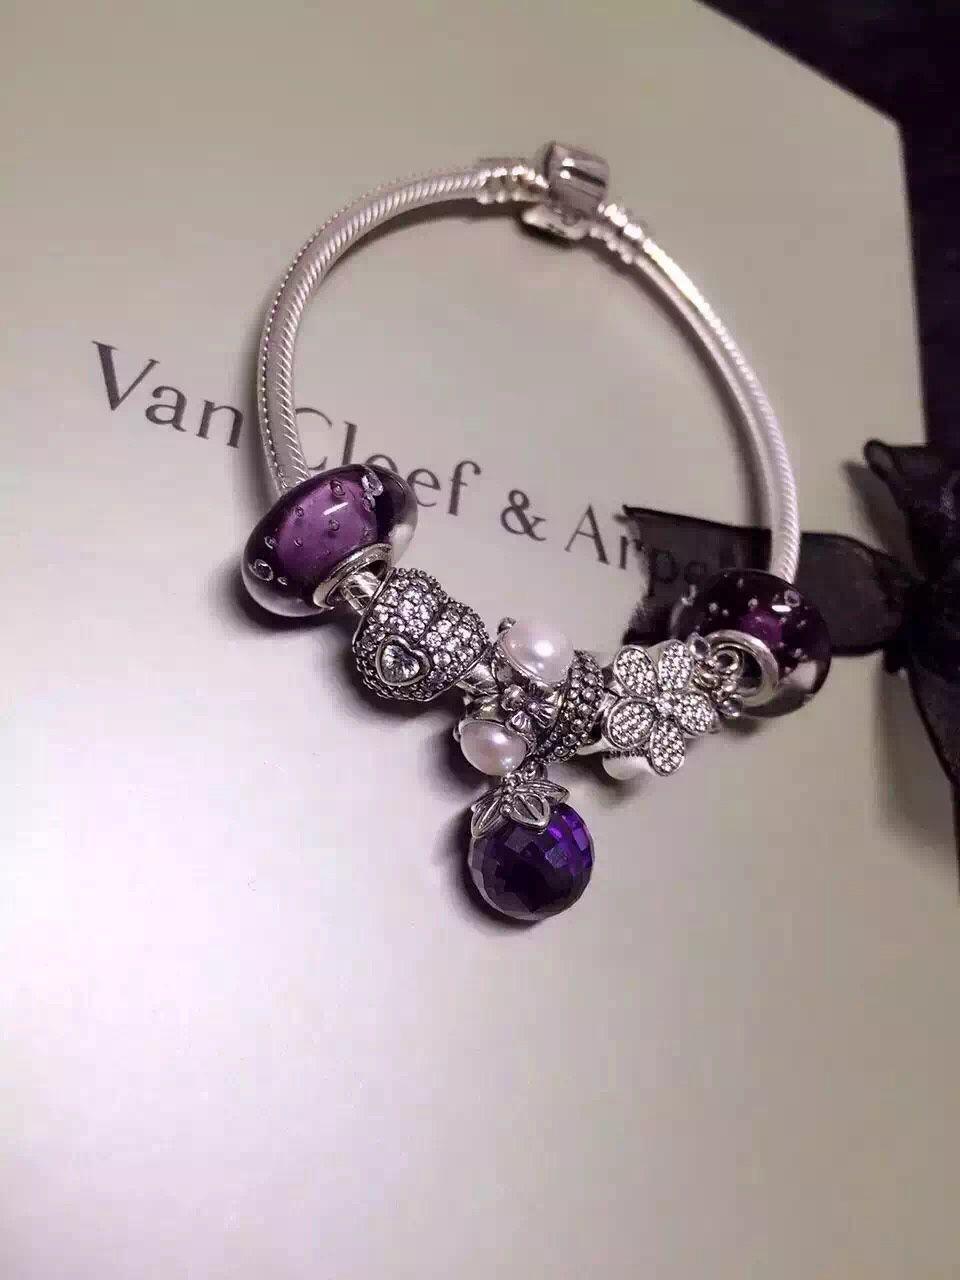 1f3082bbcf0 50% OFF!!! $199 Pandora Charm Bracelet Purple White. Hot Sale!!! SKU ...